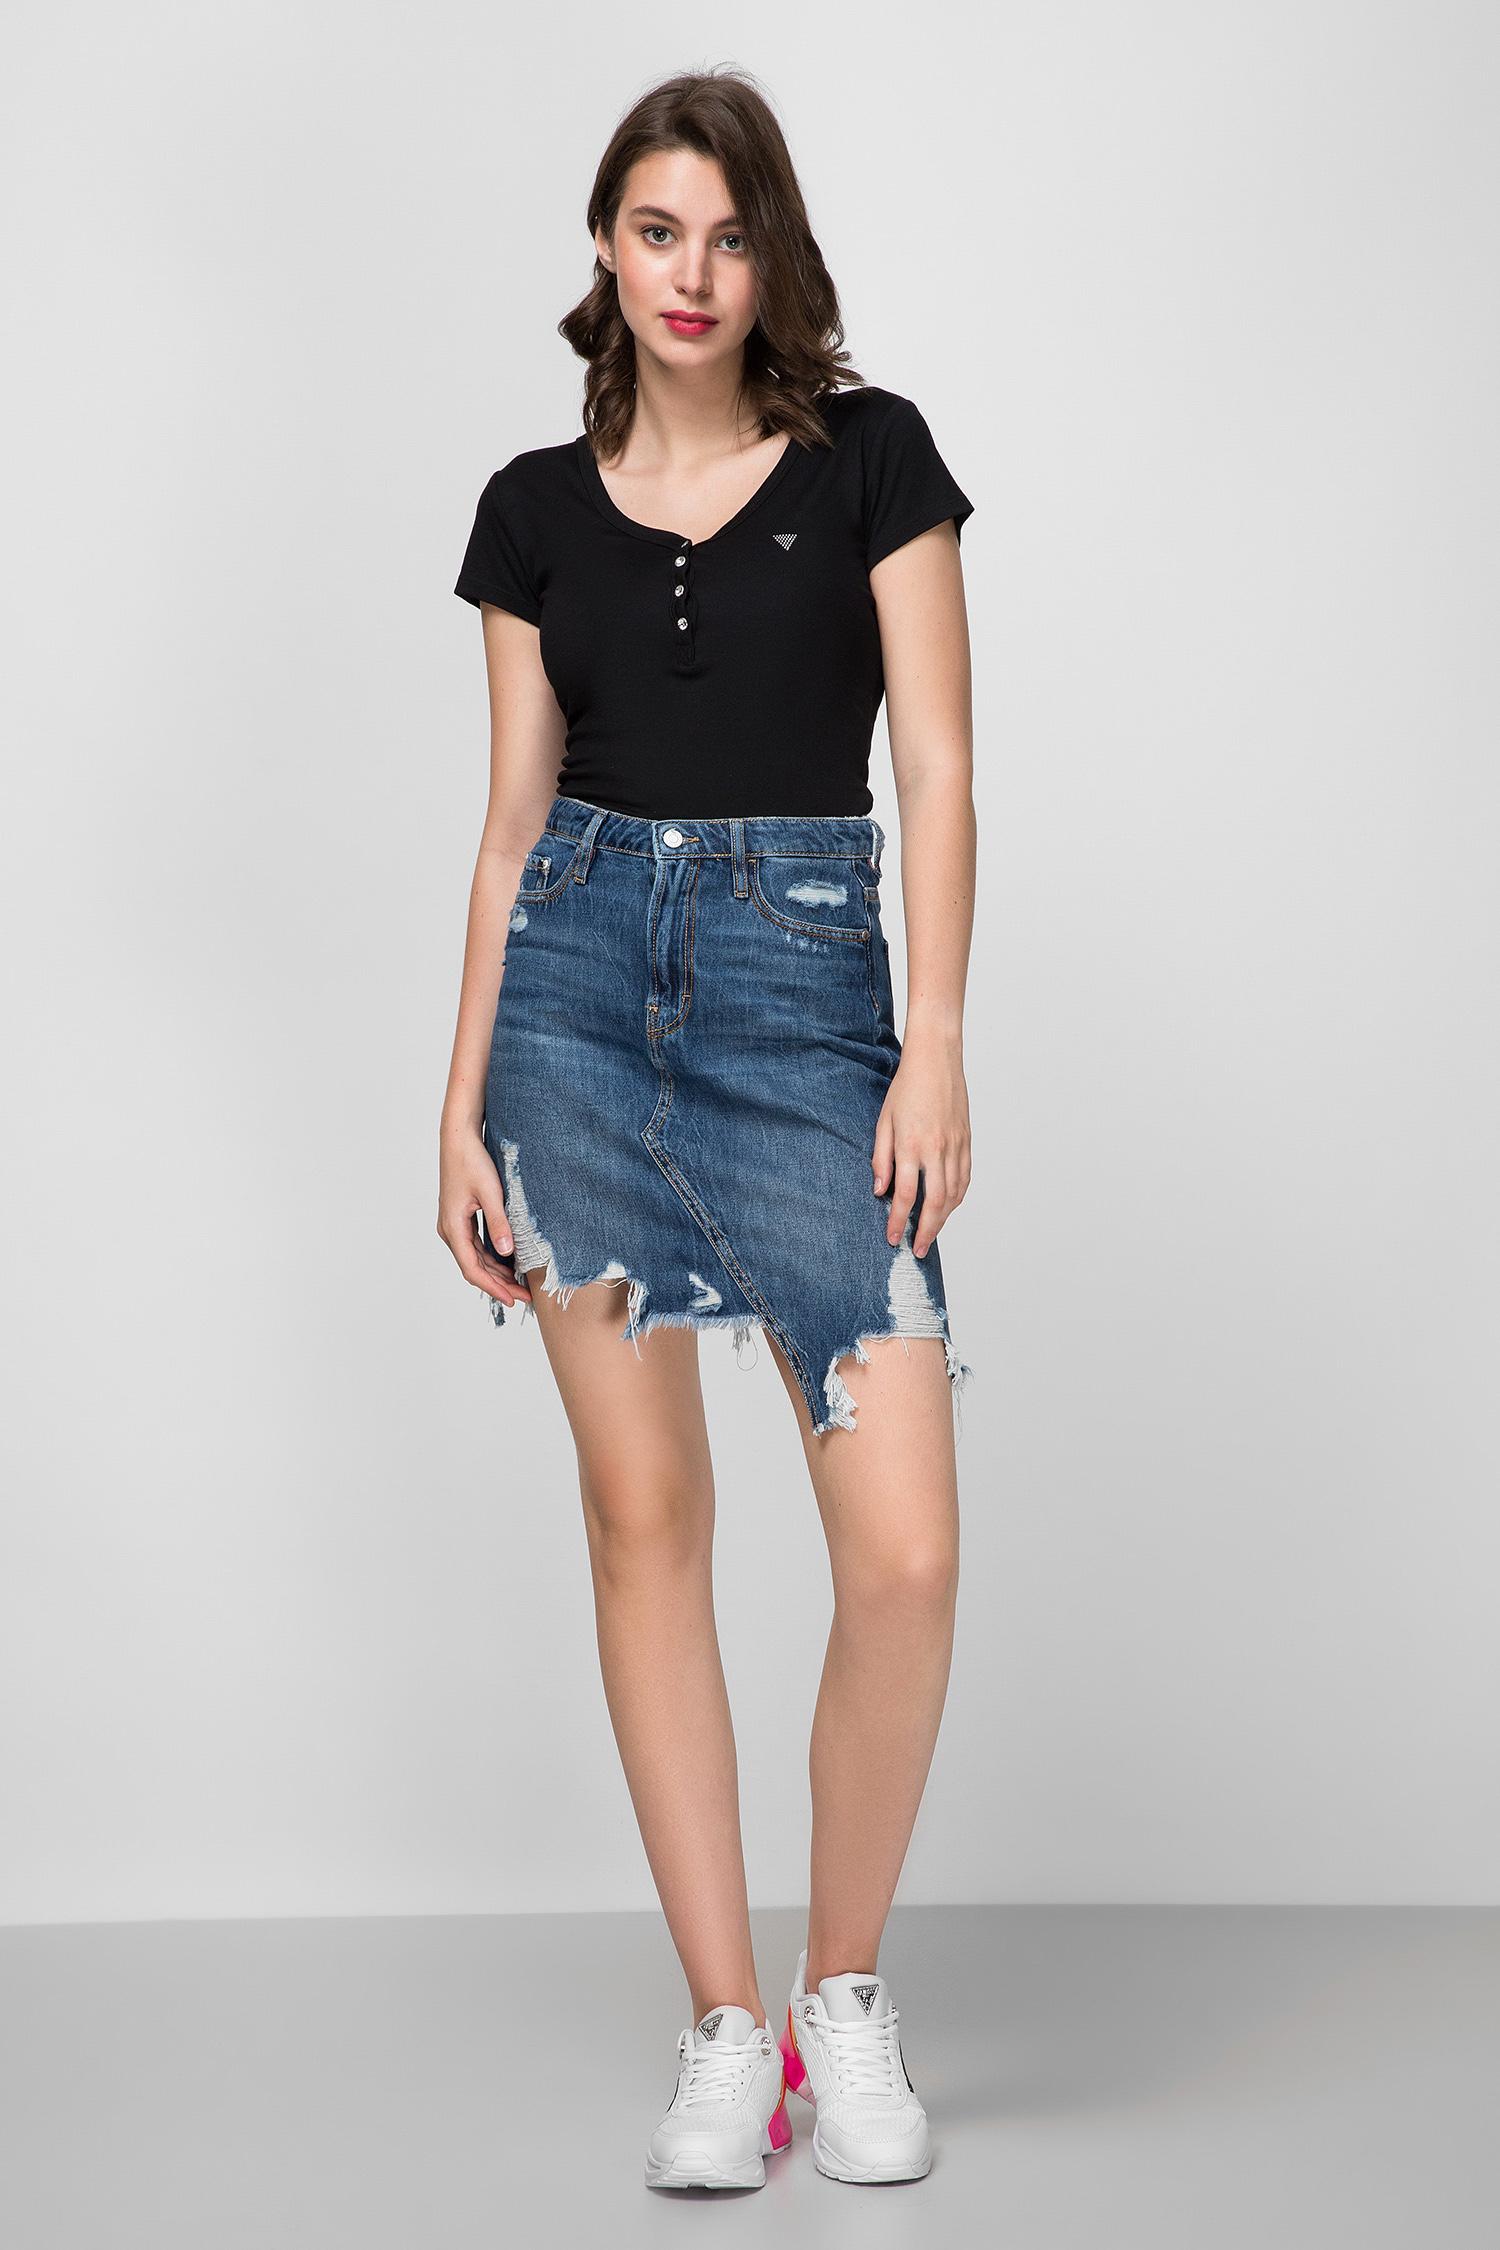 Женская черная футболка Guess W0YP76.K9VM0;JBLK